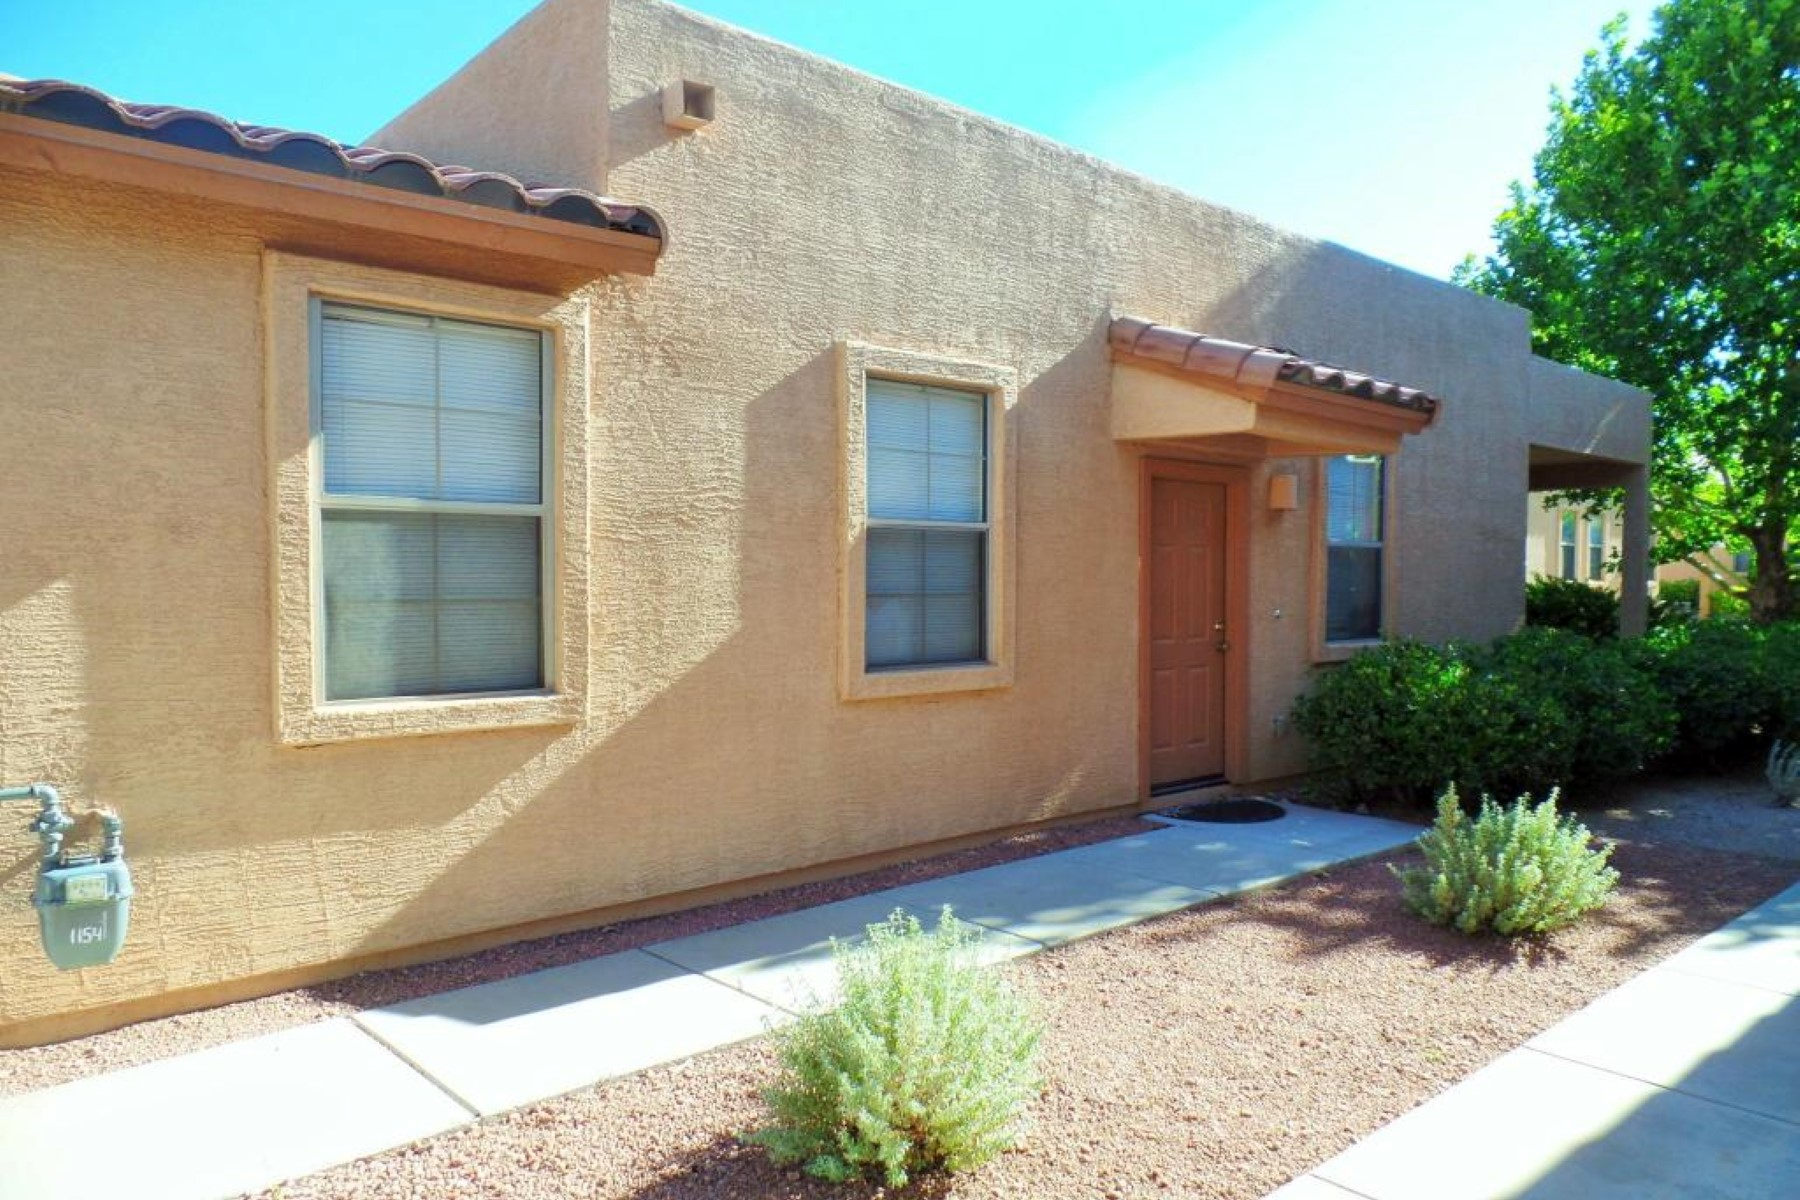 Moradia para Venda às Lovely easy to show home in cottonwood. 1150 S 17th Place Cottonwood, Arizona 86326 Estados Unidos